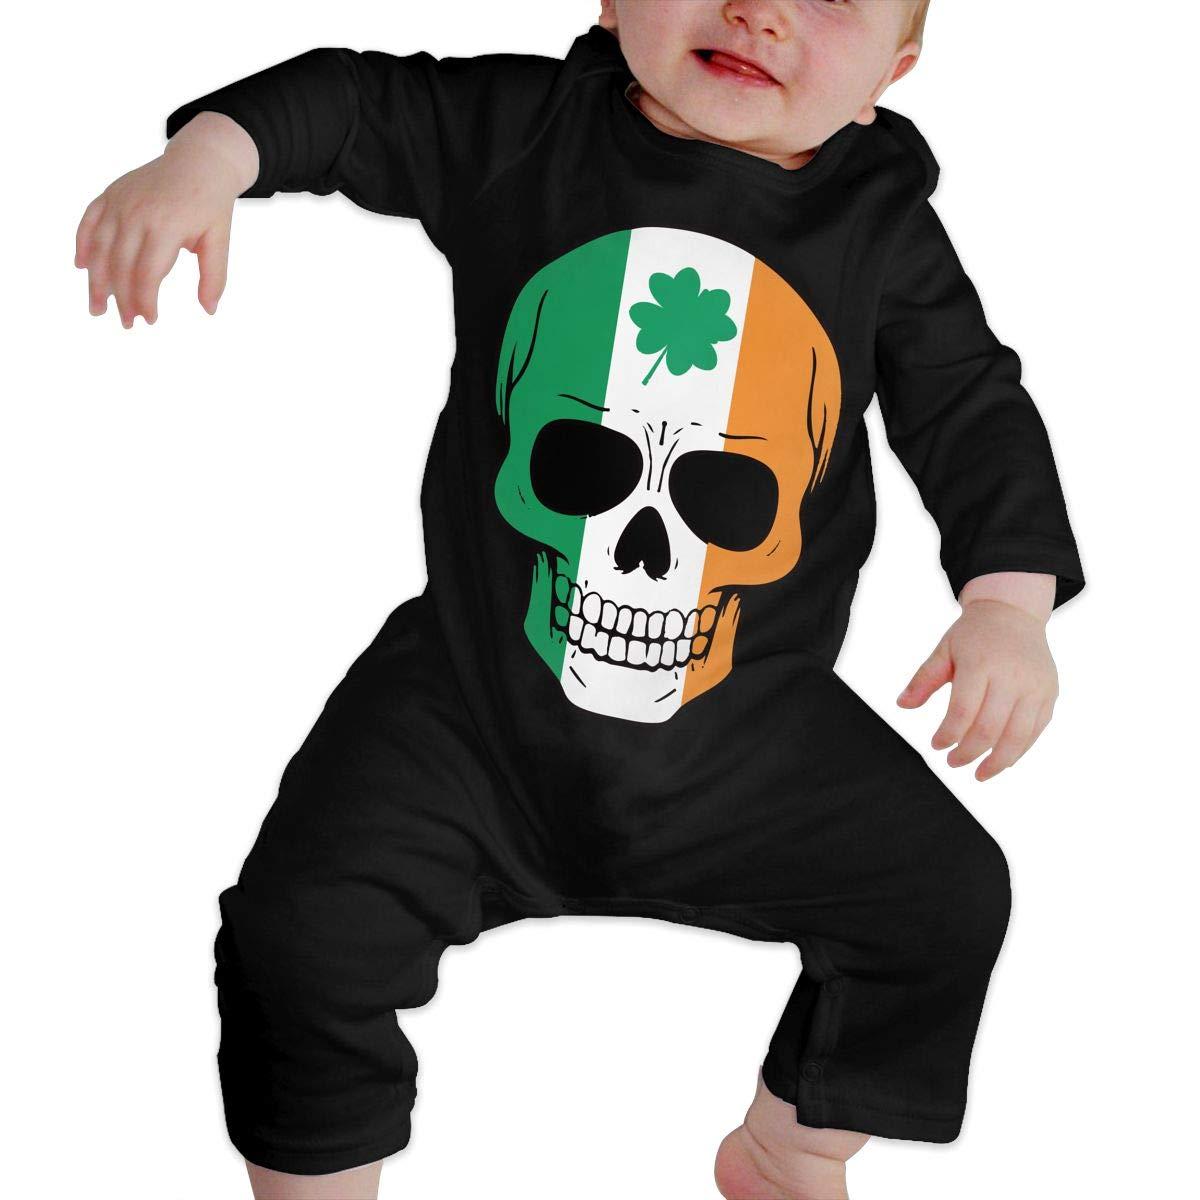 Mri-le1 Baby Girls Long Sleeved Coveralls Irish Skull St Patricks Day Baby Clothes